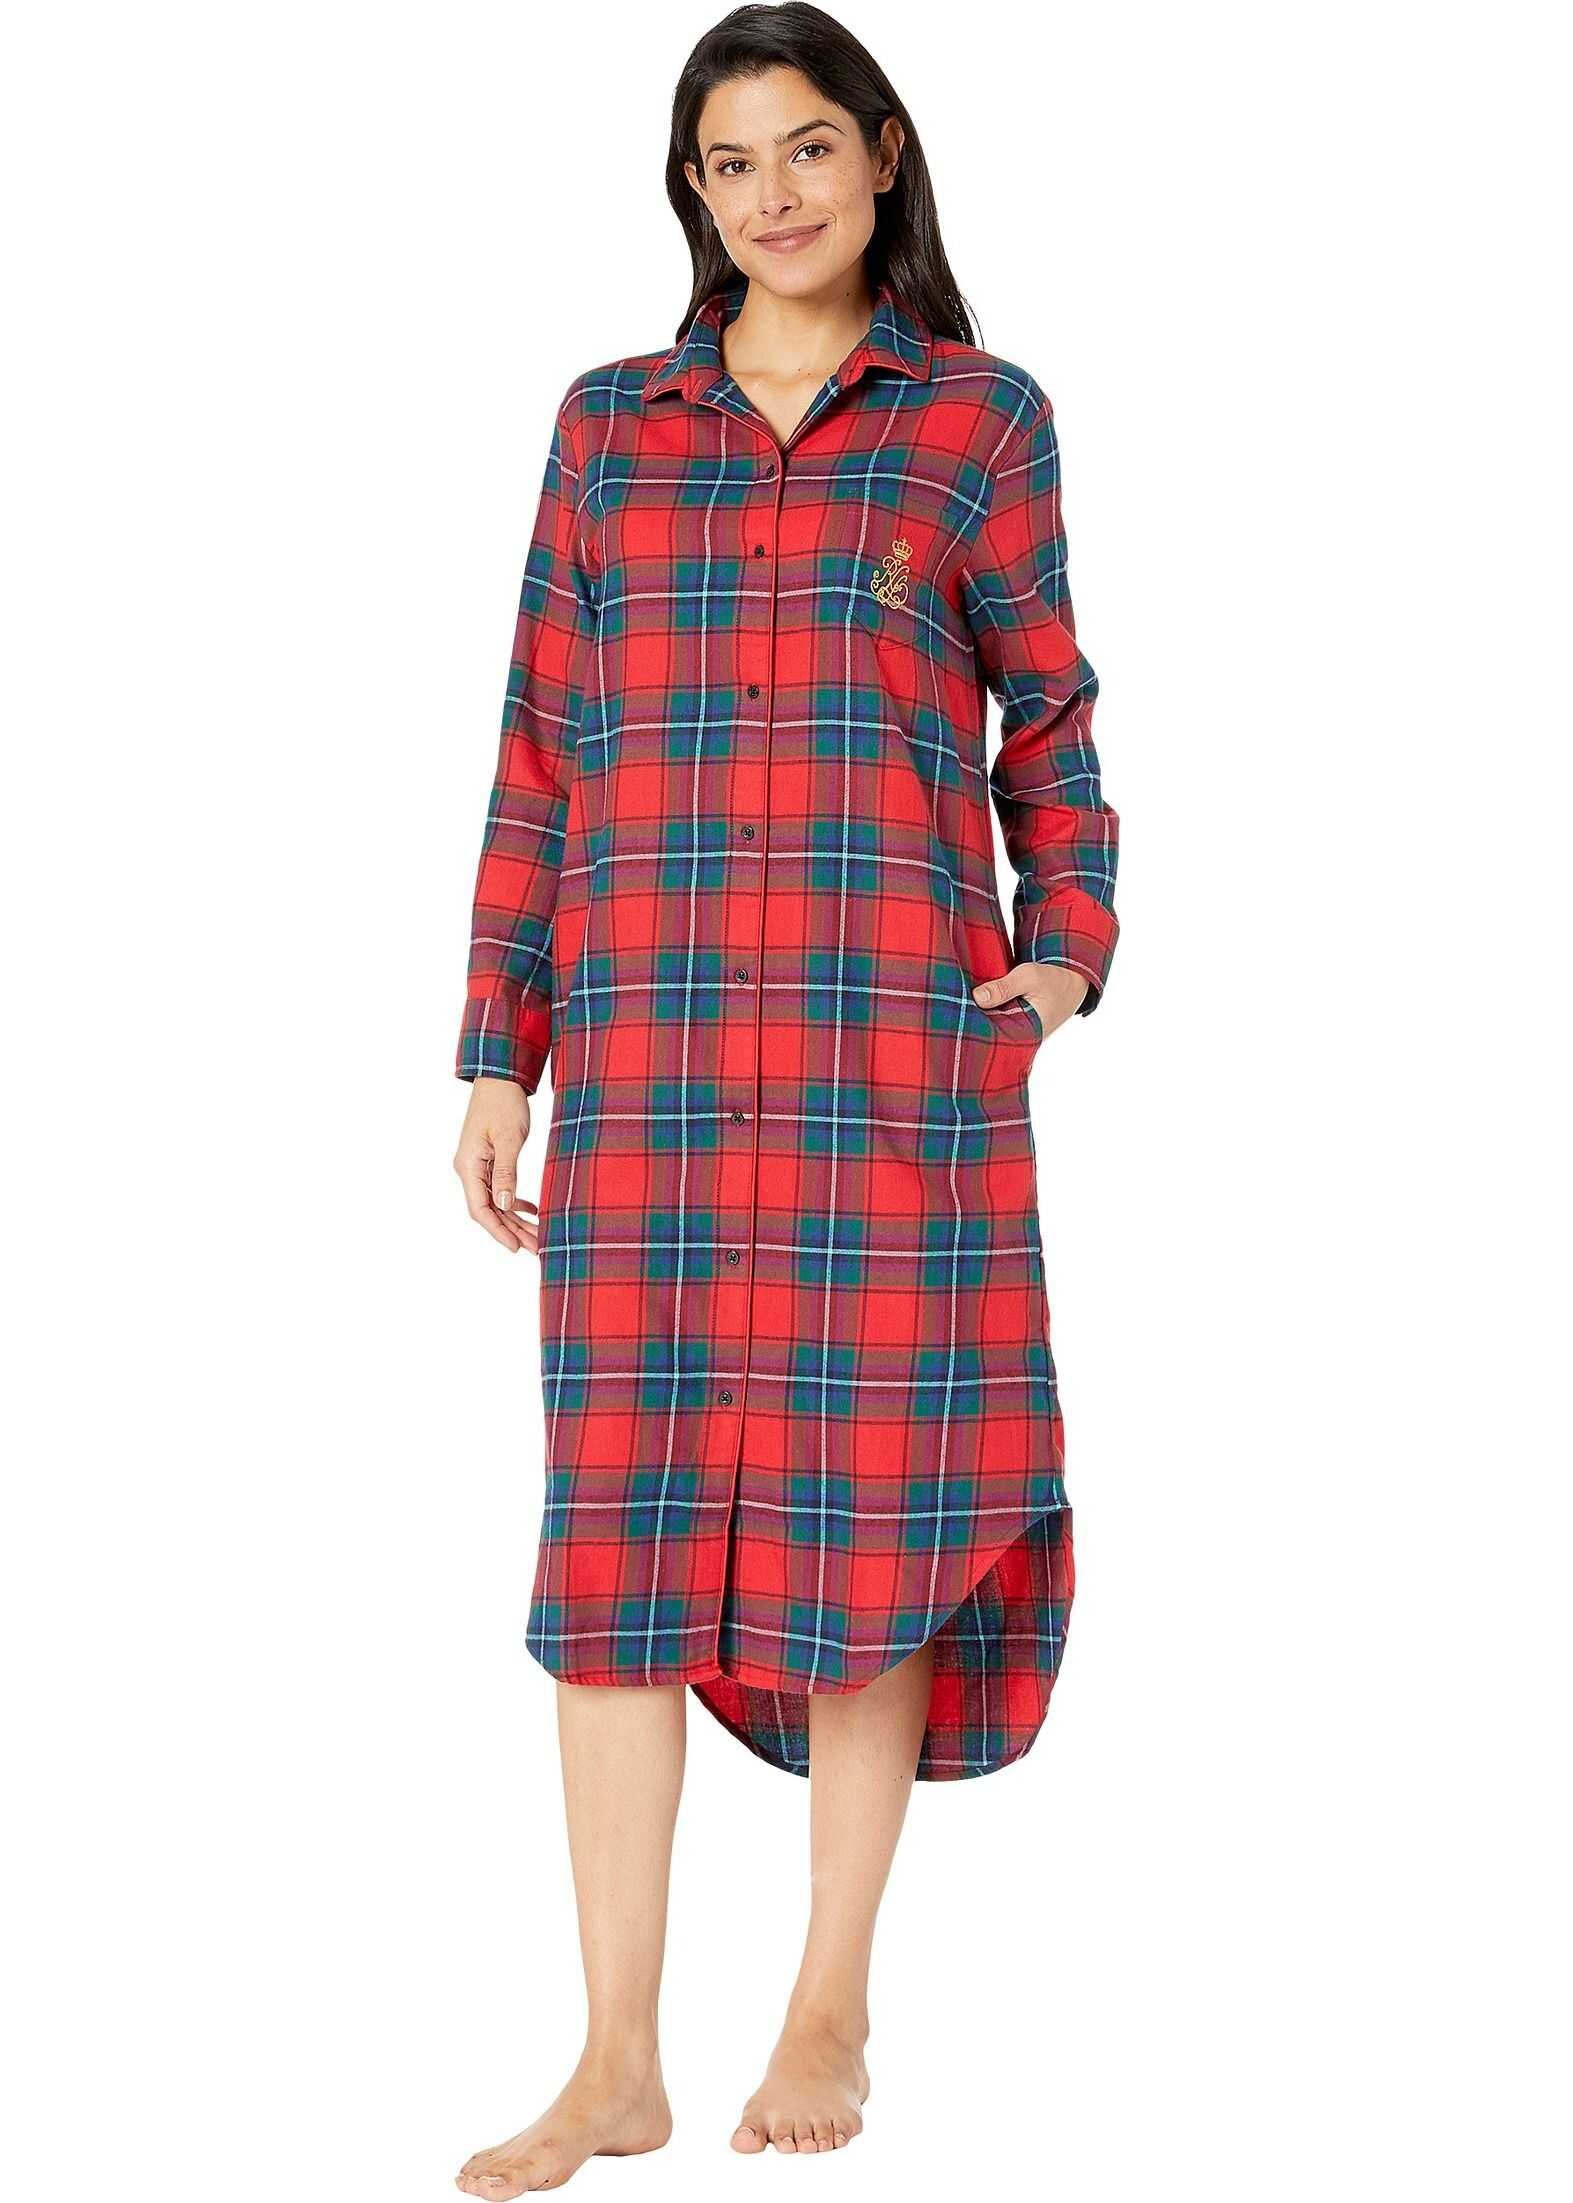 Ralph Lauren Brushed Twill Long Sleeve Rounded Notch Collar Ballet Sleepshirt Red Plaid